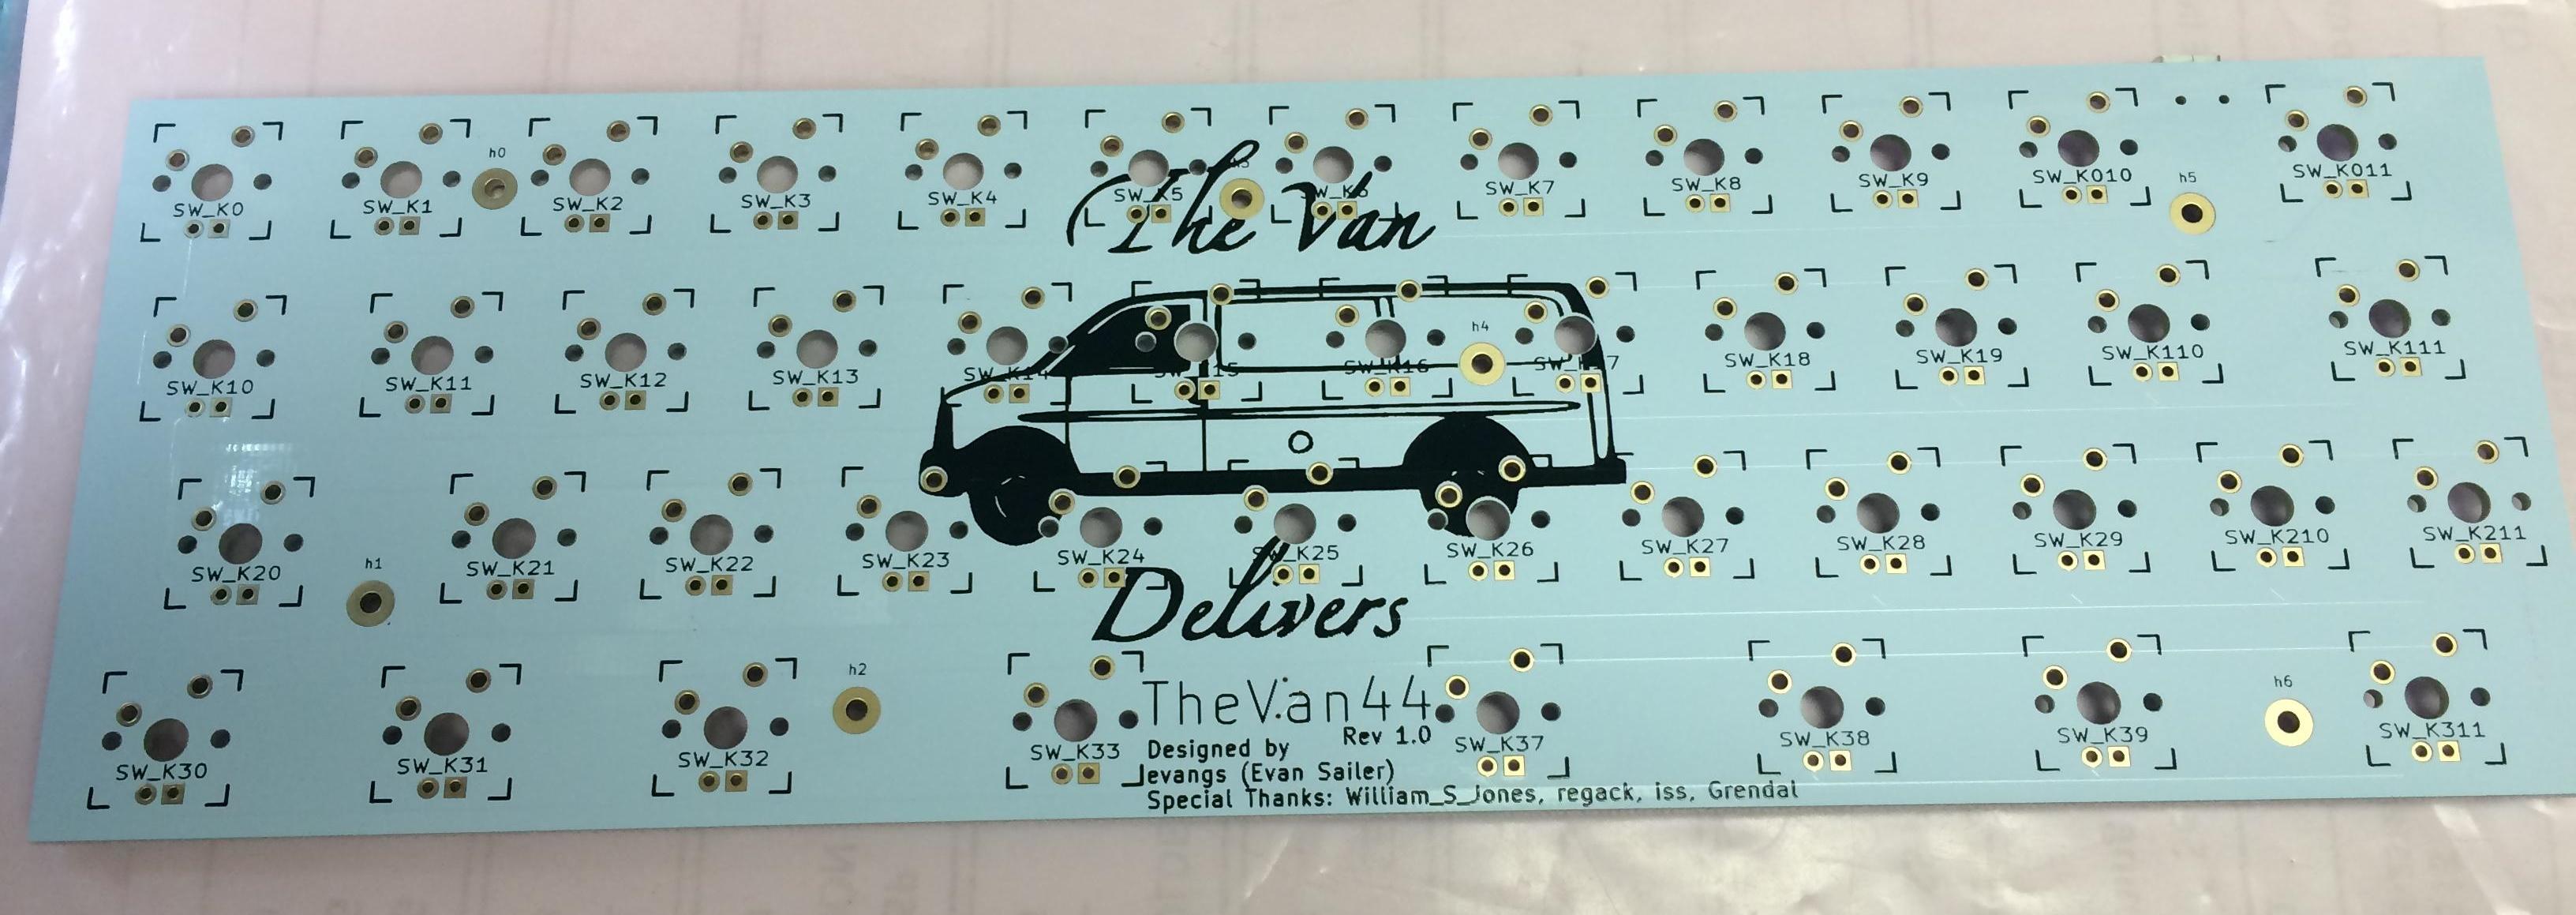 TheVan44 Rev 1.0 front